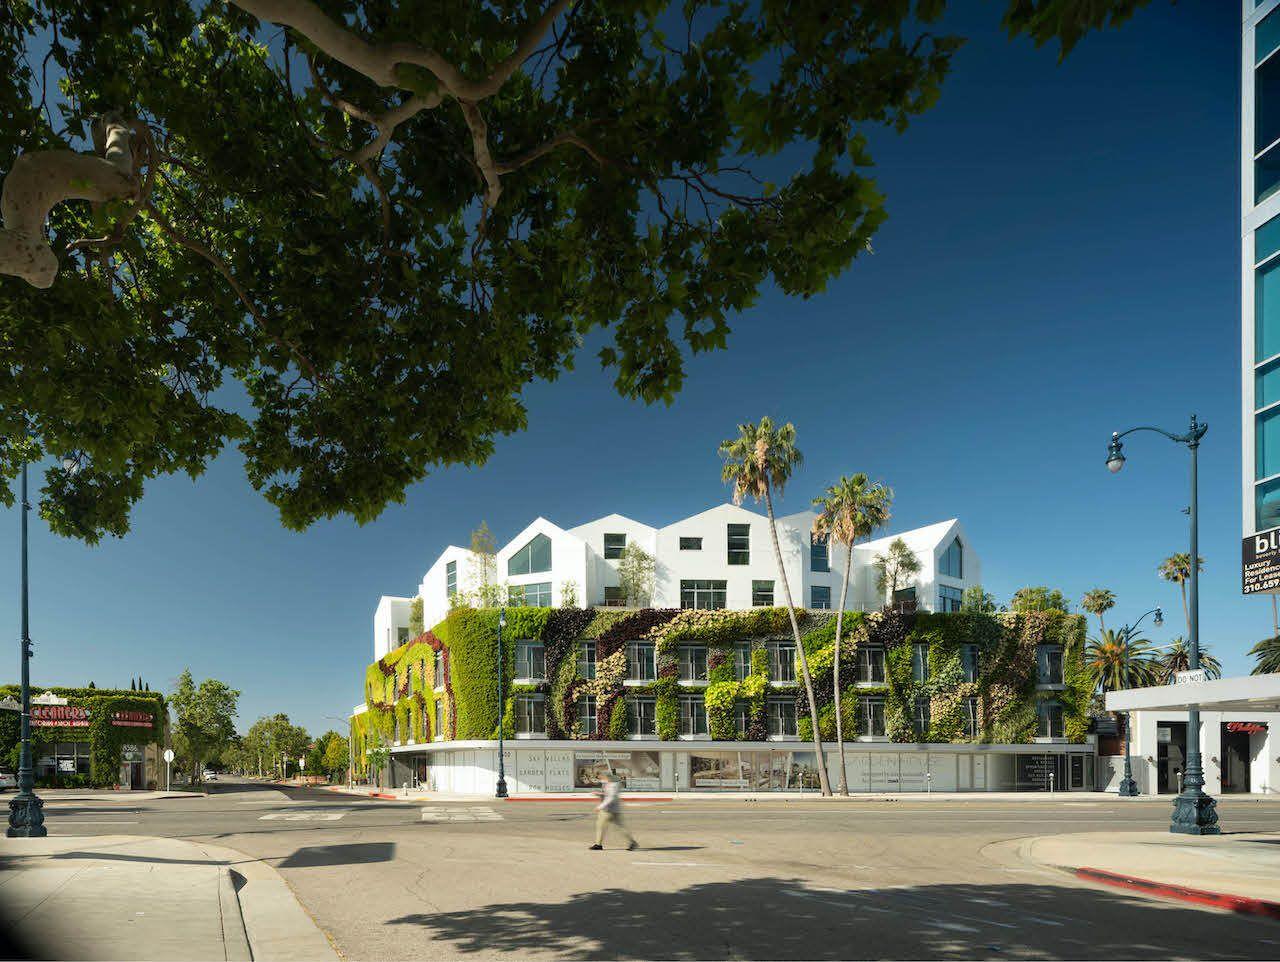 Gardenhouse greenwall Beverly Hills Los Angeles